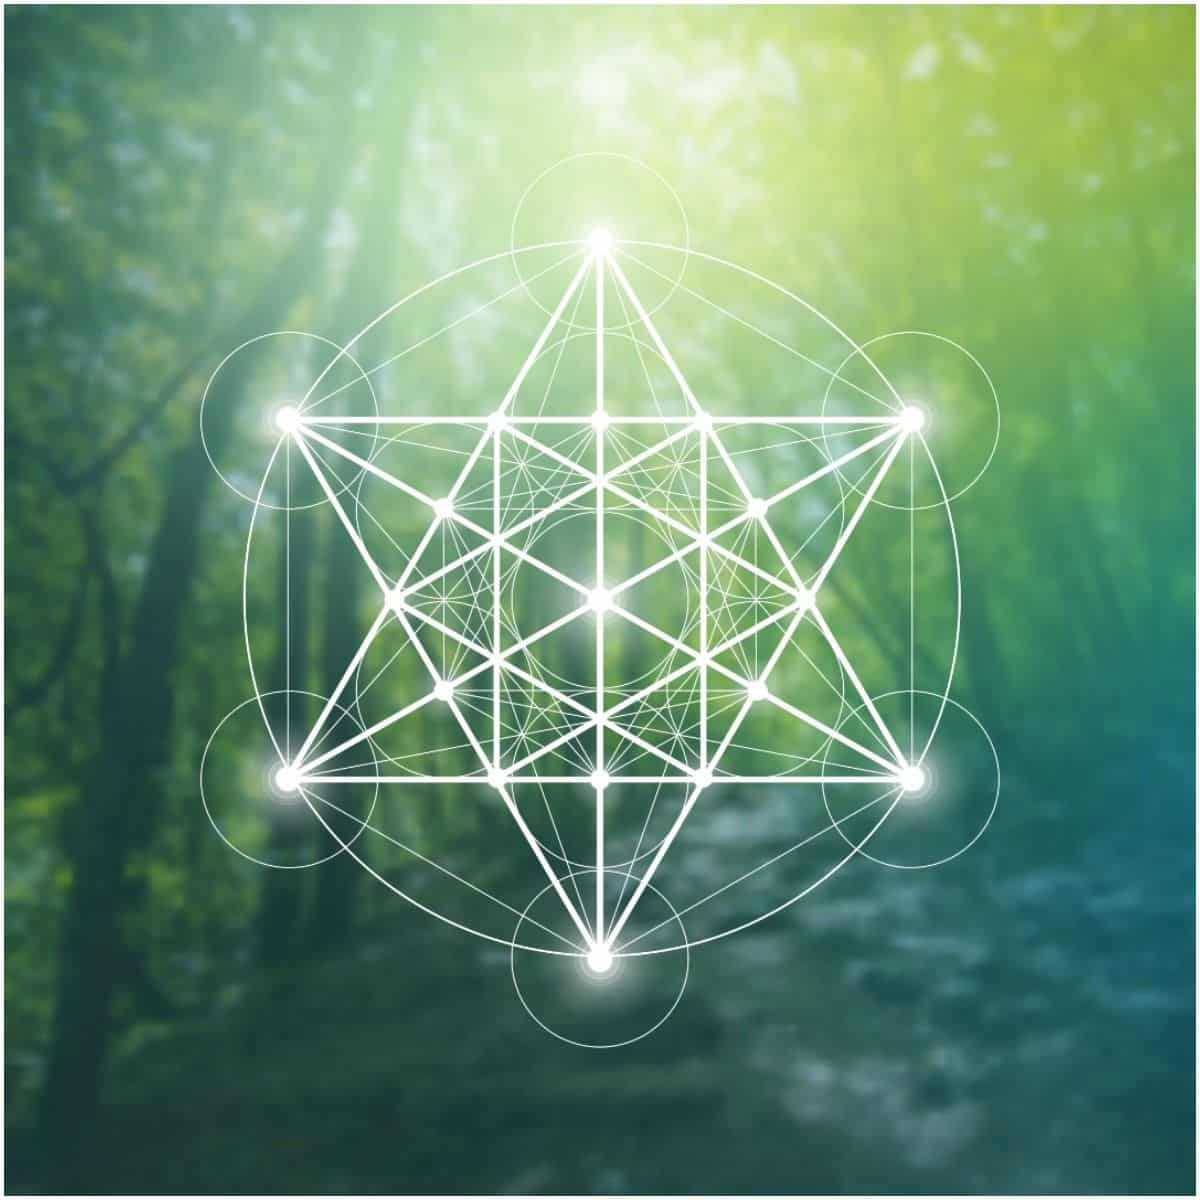 Merkaba Meditation Benefits